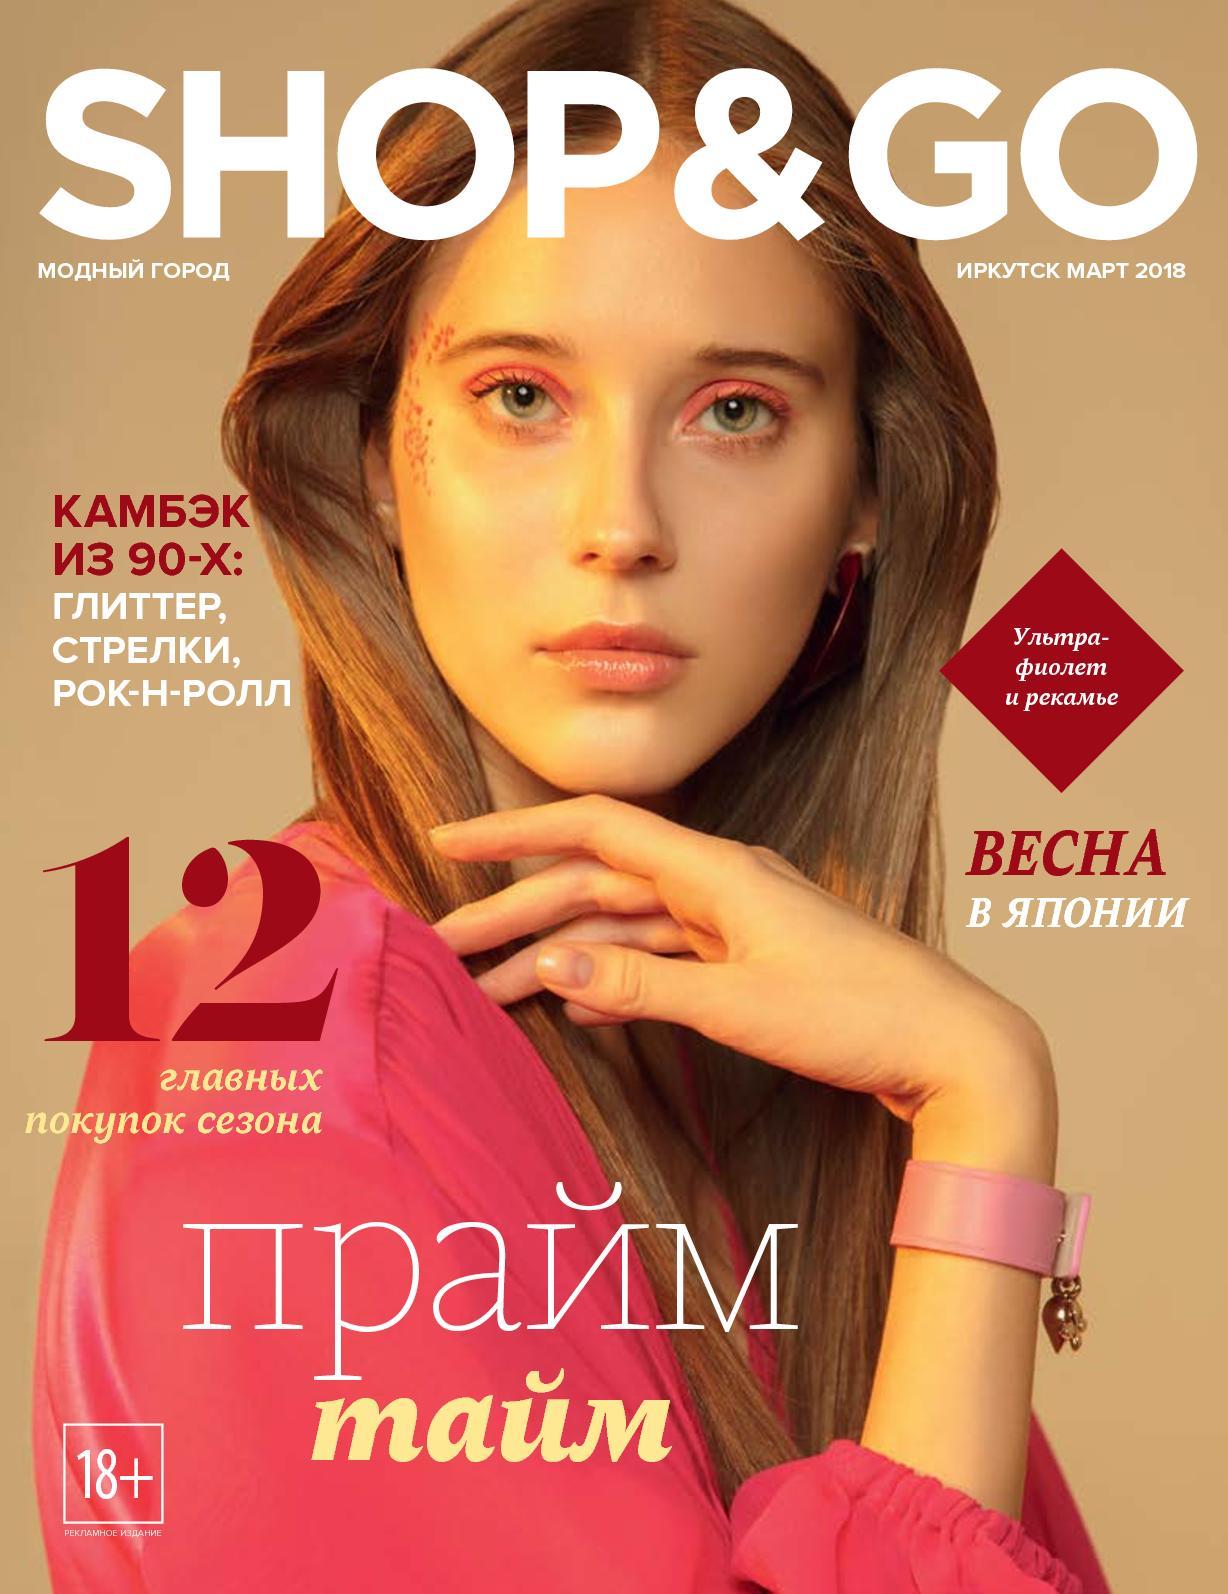 SHOP&GO Иркутск Март 2018